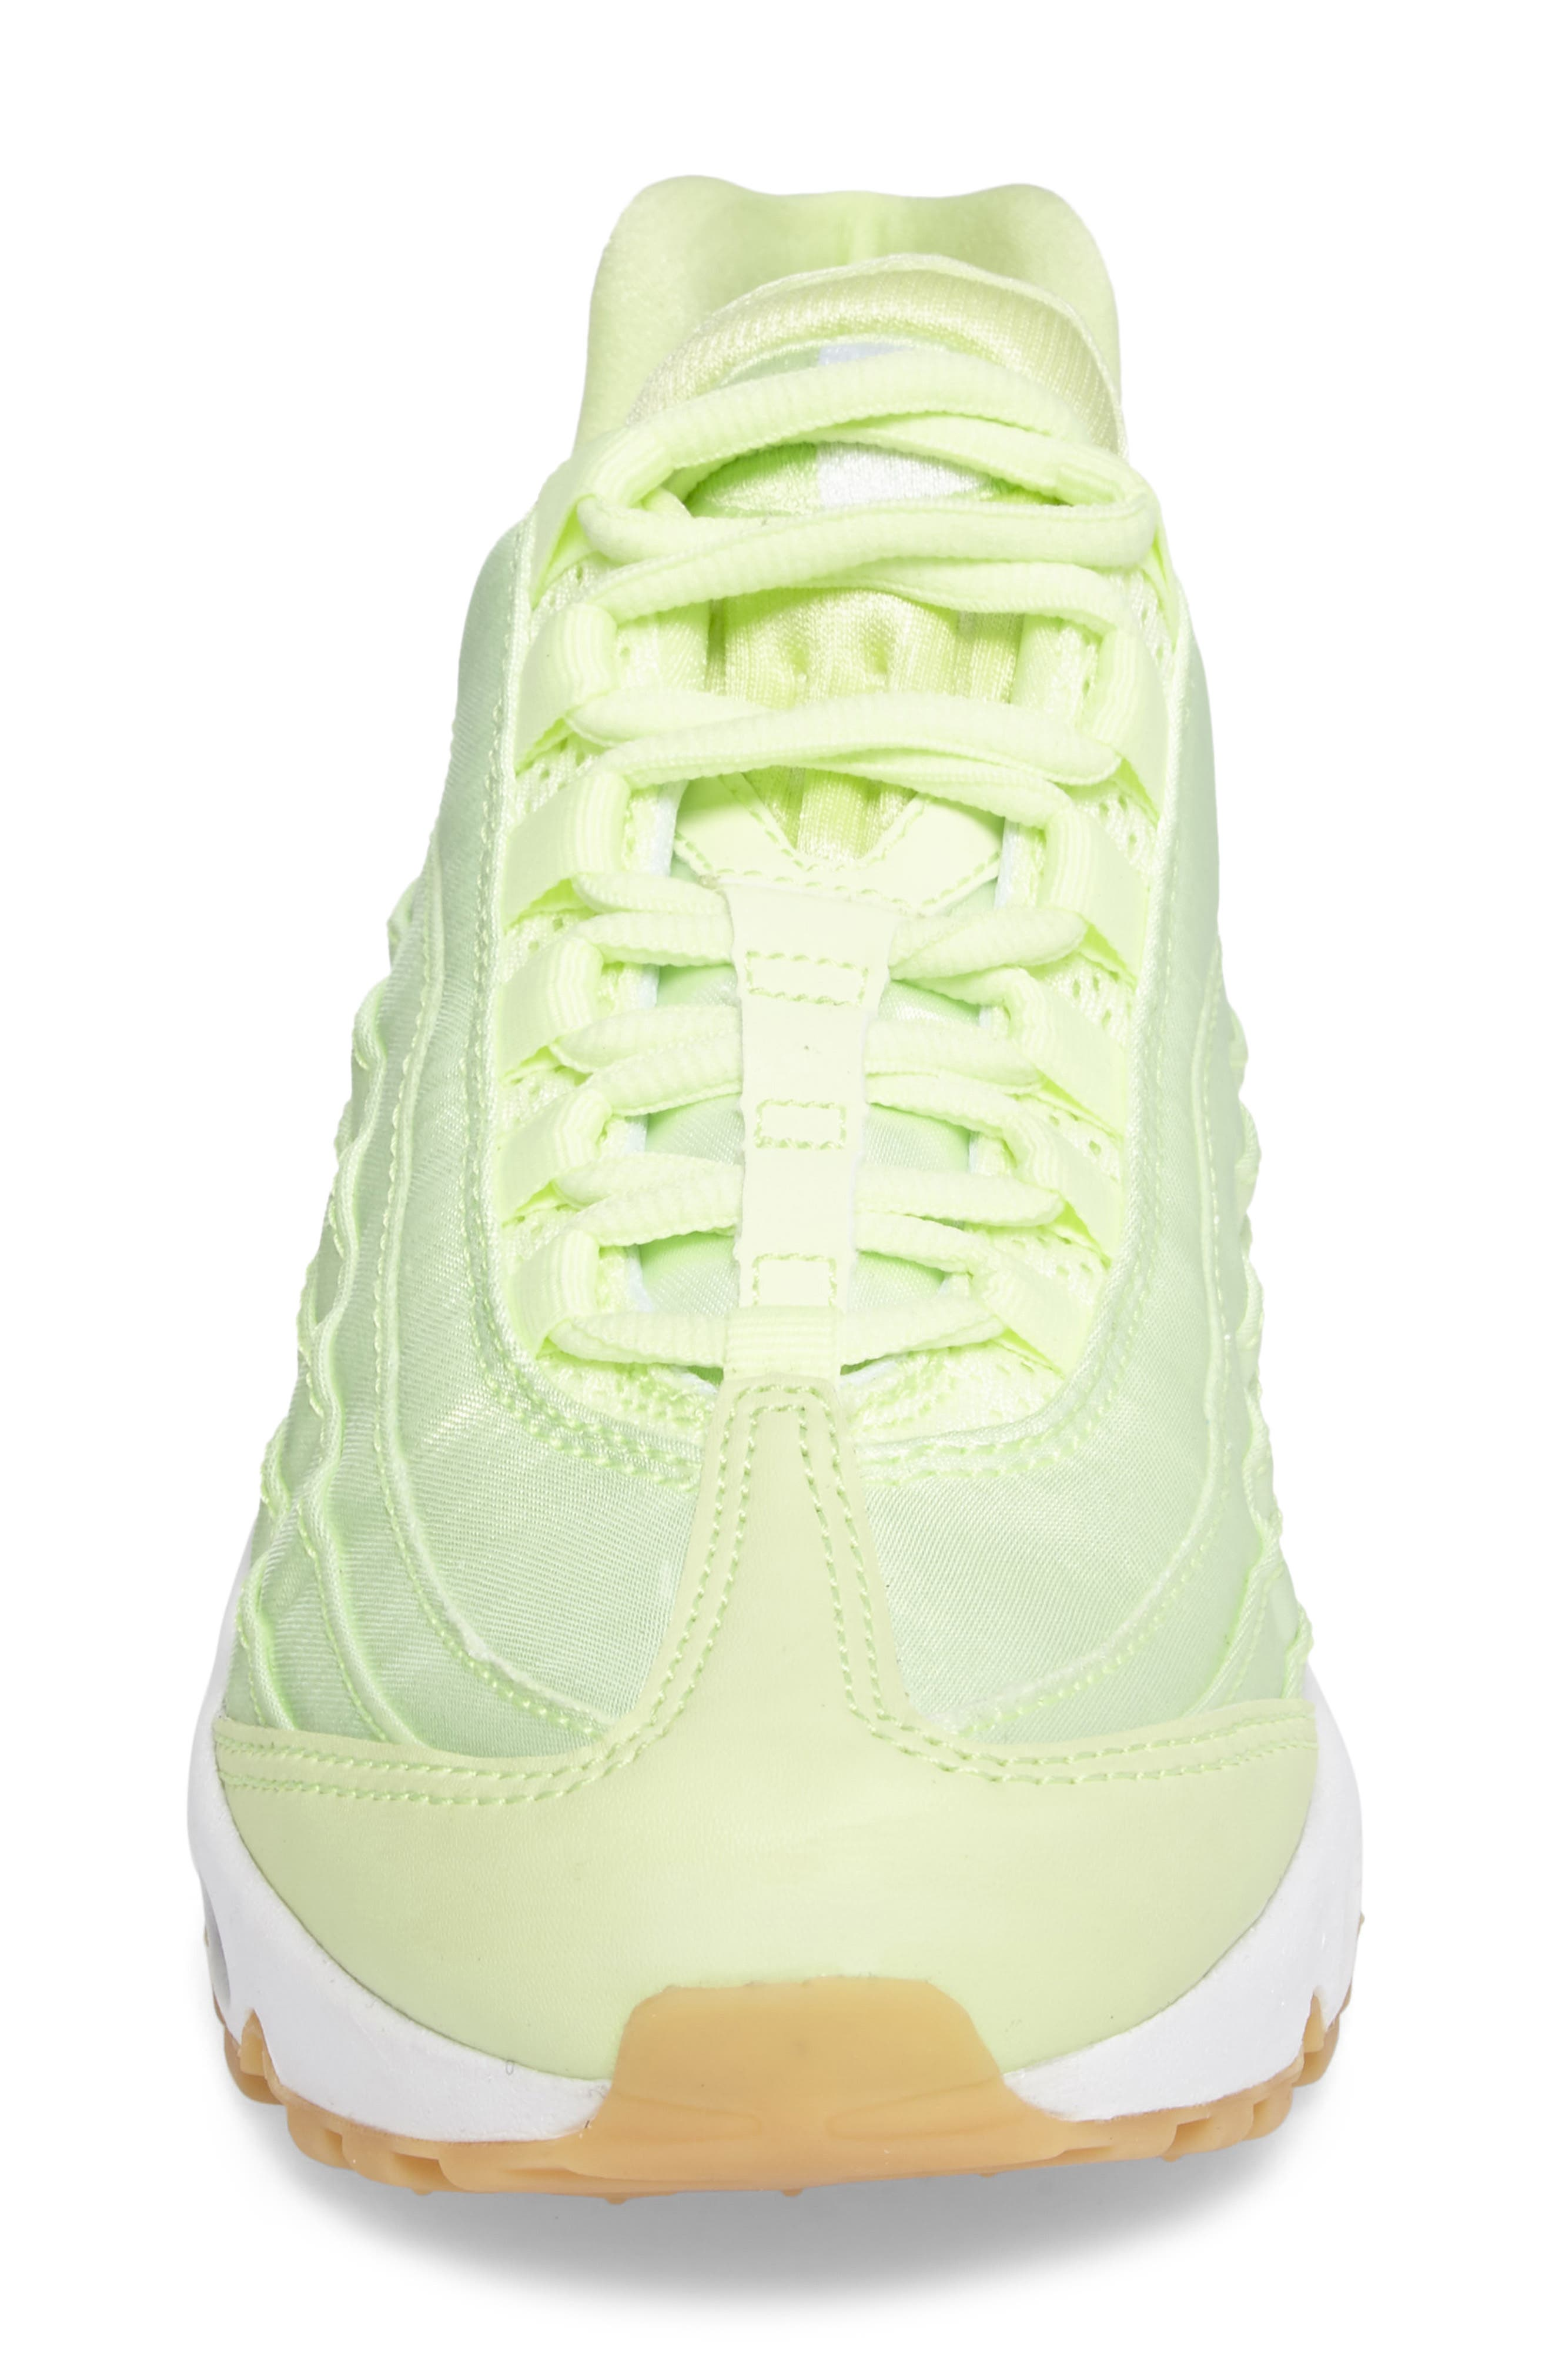 Air Max 95 QS Running Shoe,                             Alternate thumbnail 4, color,                             300